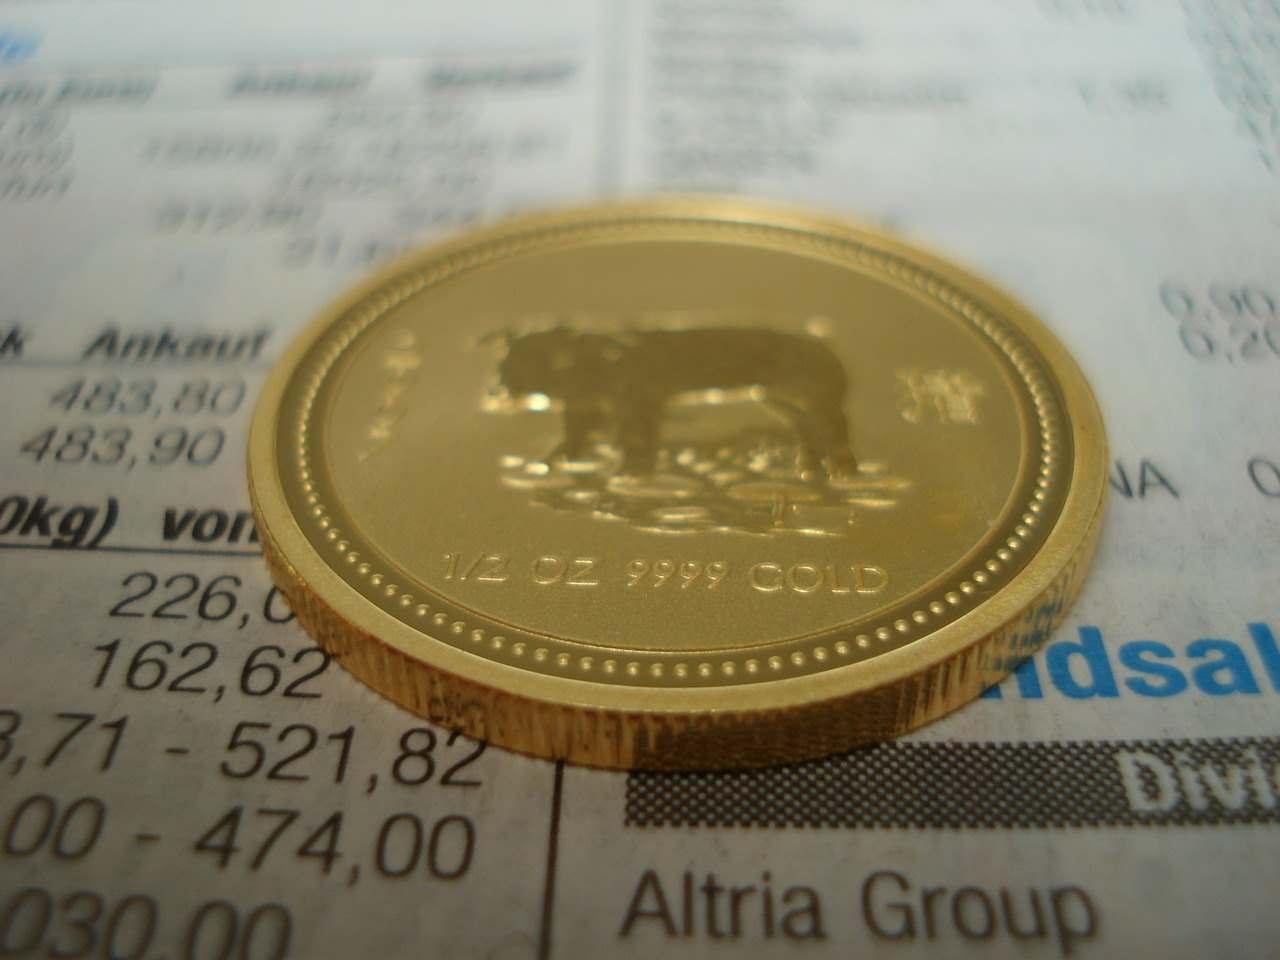 Griechenland-News.Net - Griechenland Infos & Griechenland Tipps | Euro-Parität zum US-Dollar bald Wirklichkeit? (Nachweis: pixabay.com)